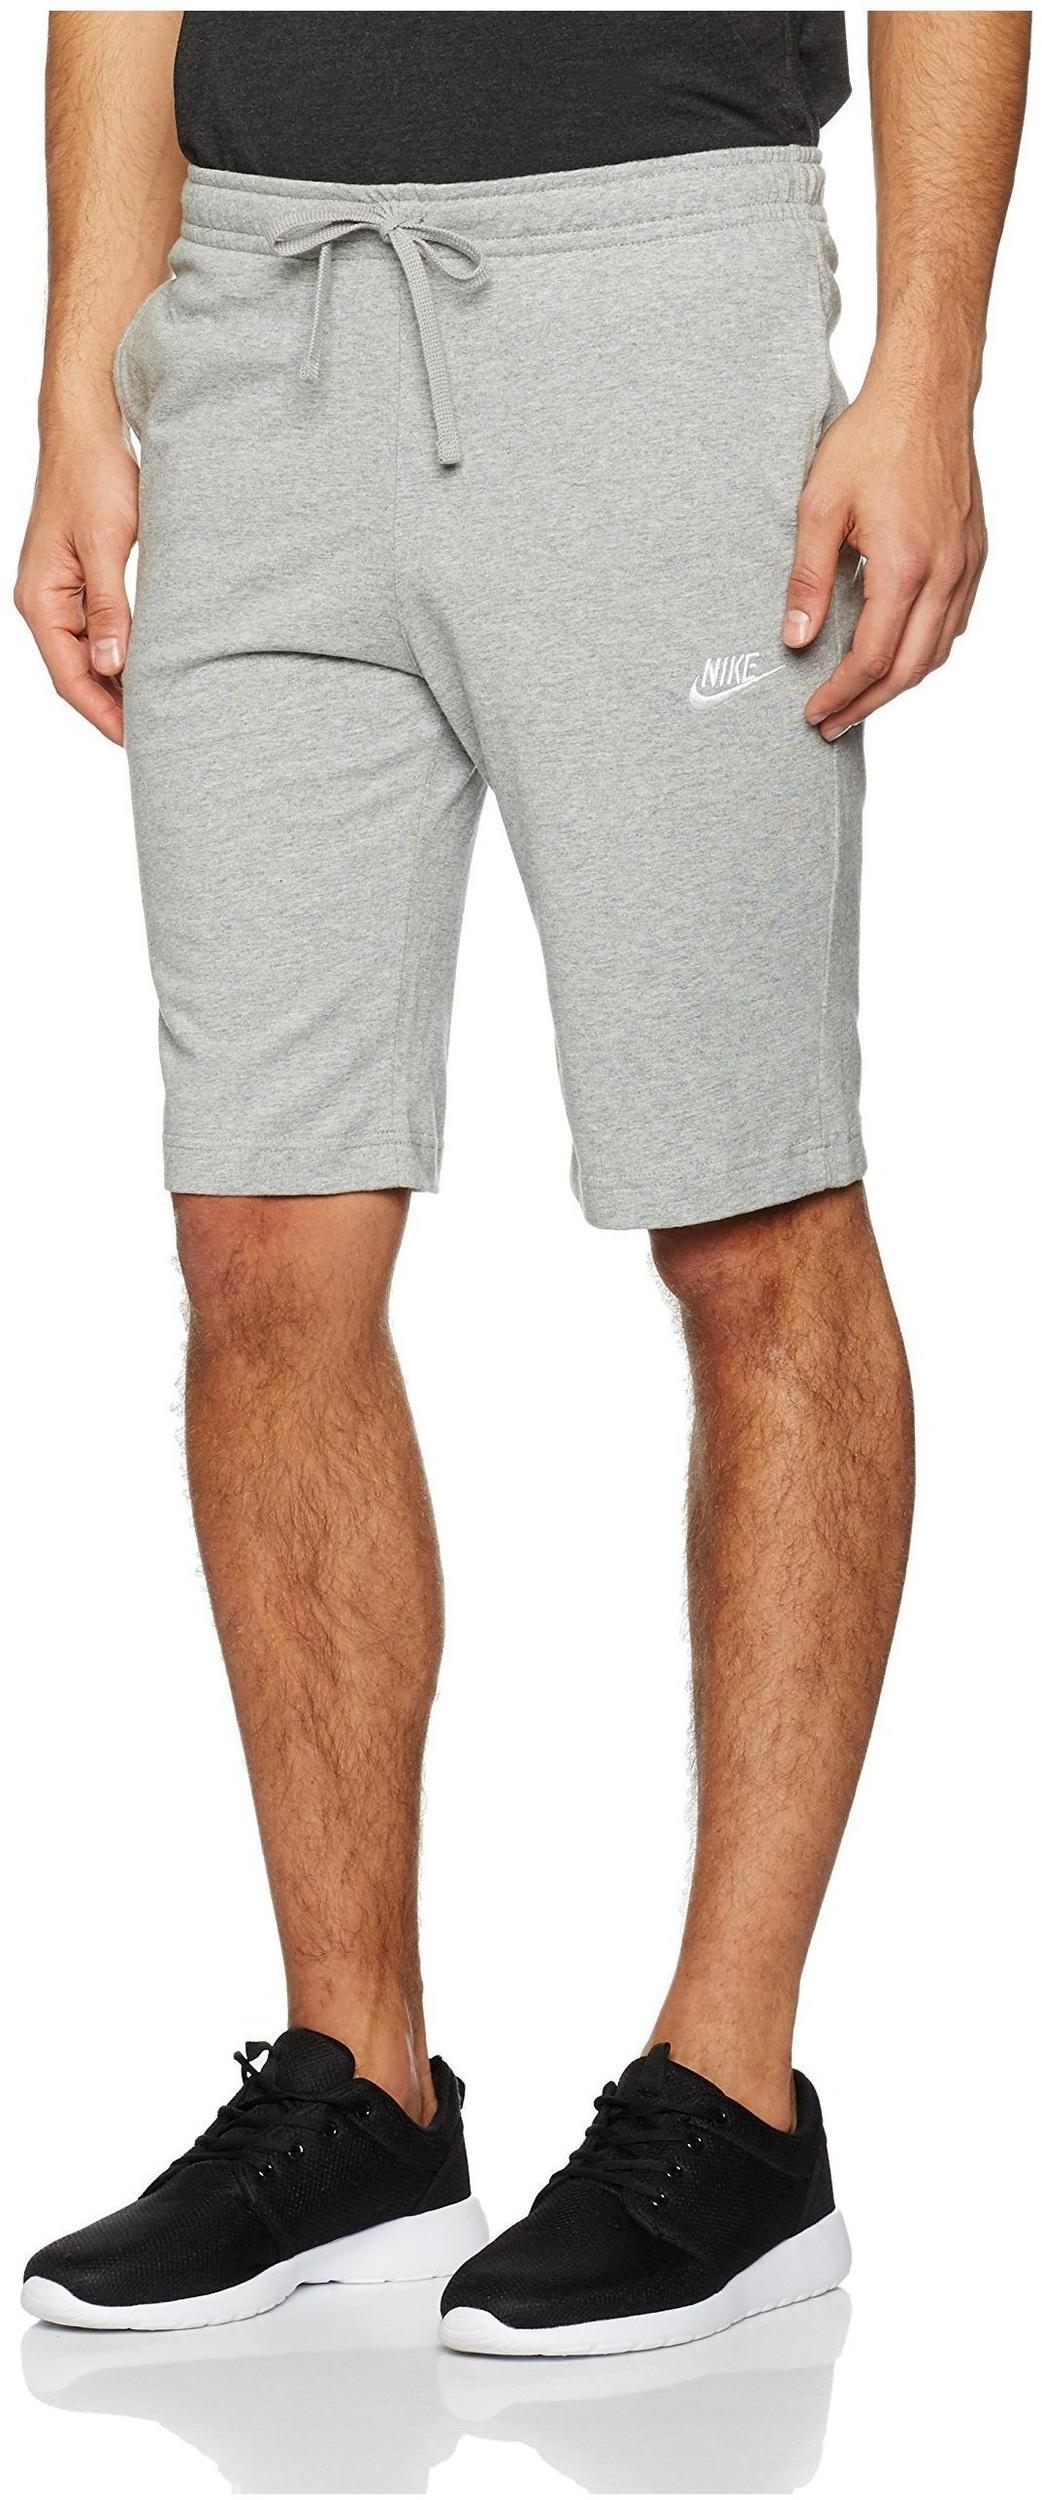 brand new 9e030 8099f Nike Nsw Short Jsy Club Shorts, Herren grau S